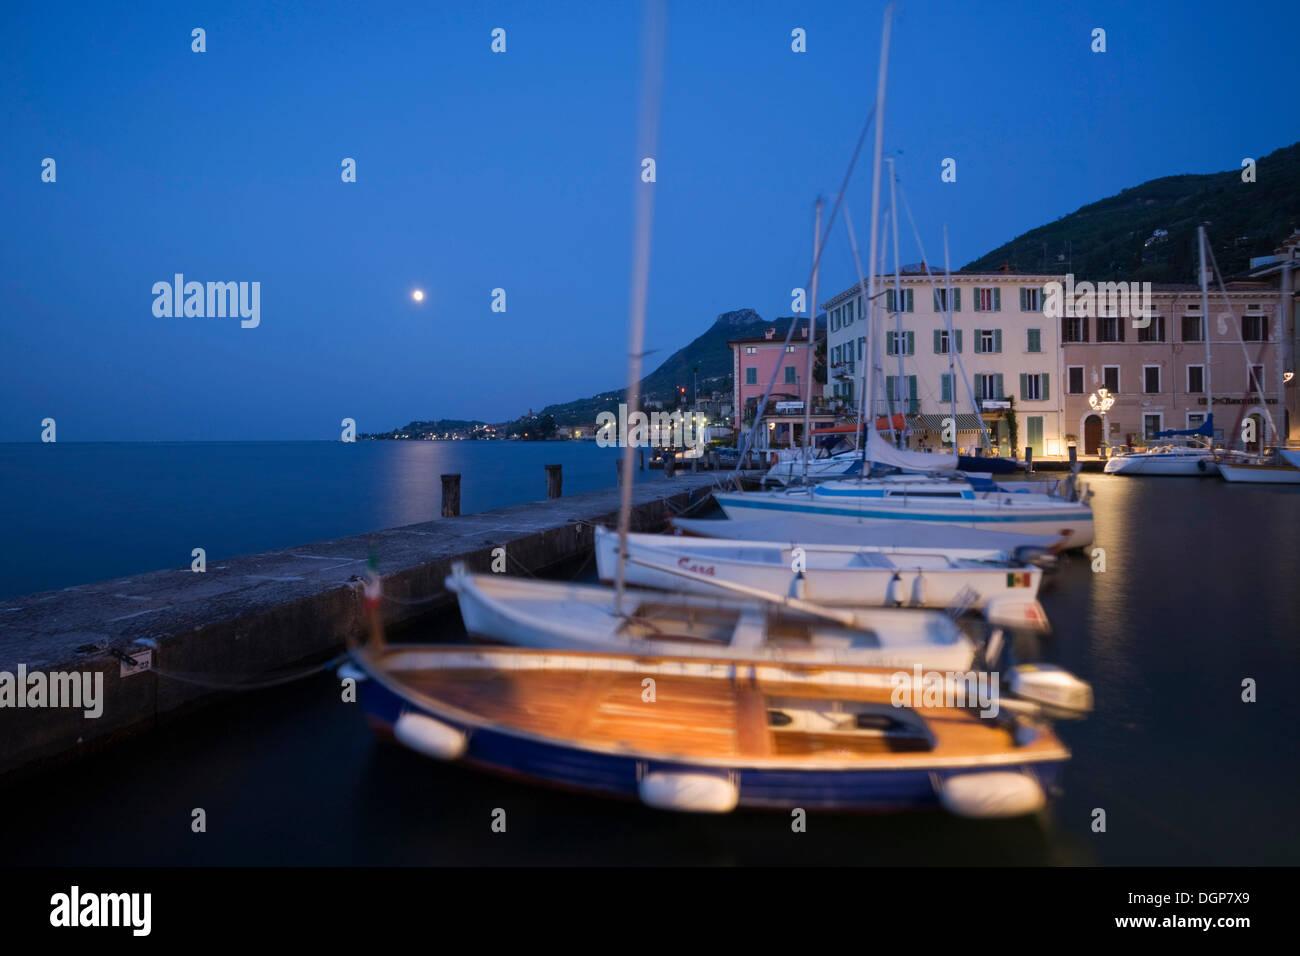 Moon over the port of Gargnano, Lake Garda, Lombardy, Italy, Europe - Stock Image